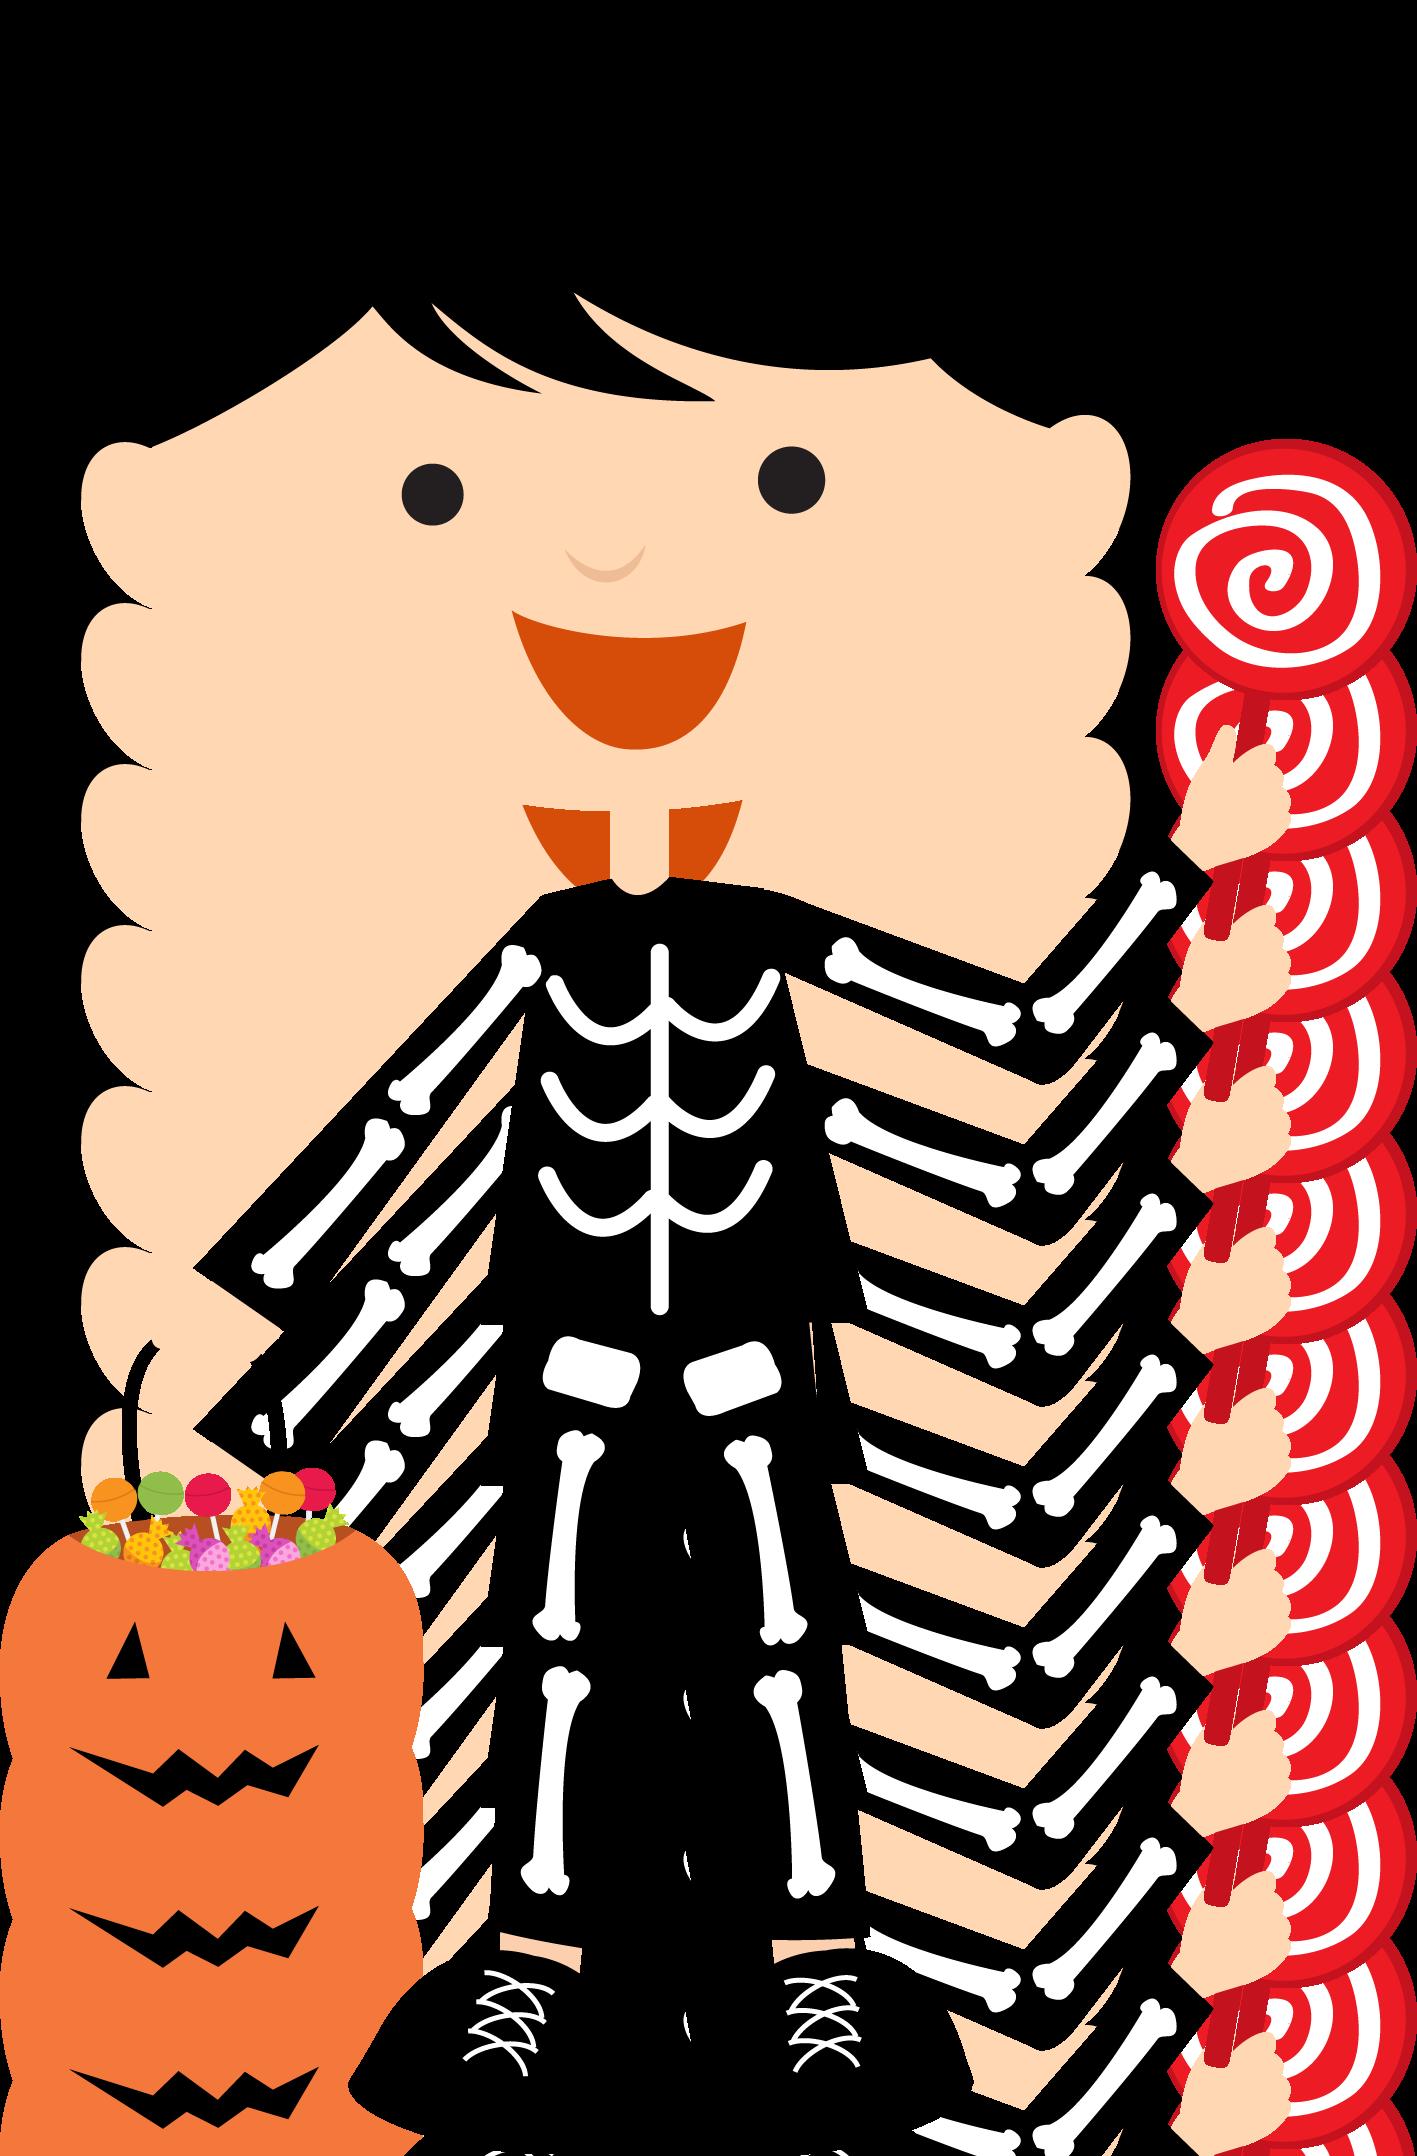 Garland clipart halloween. Bdhalloweentrickortreat png minus clip